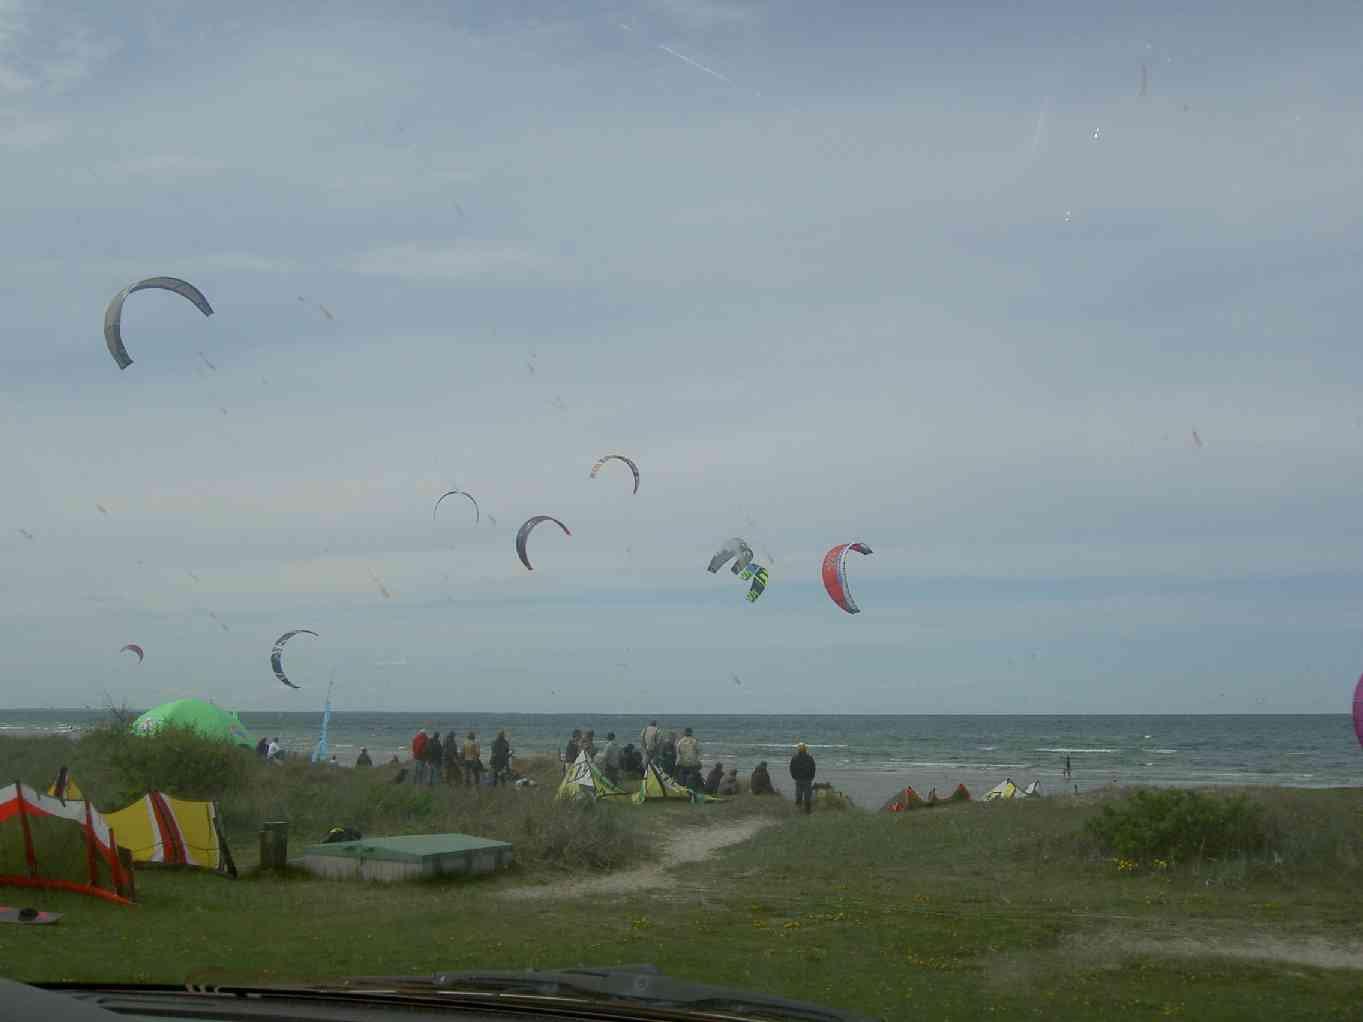 A day on the beach - Kitesurfing